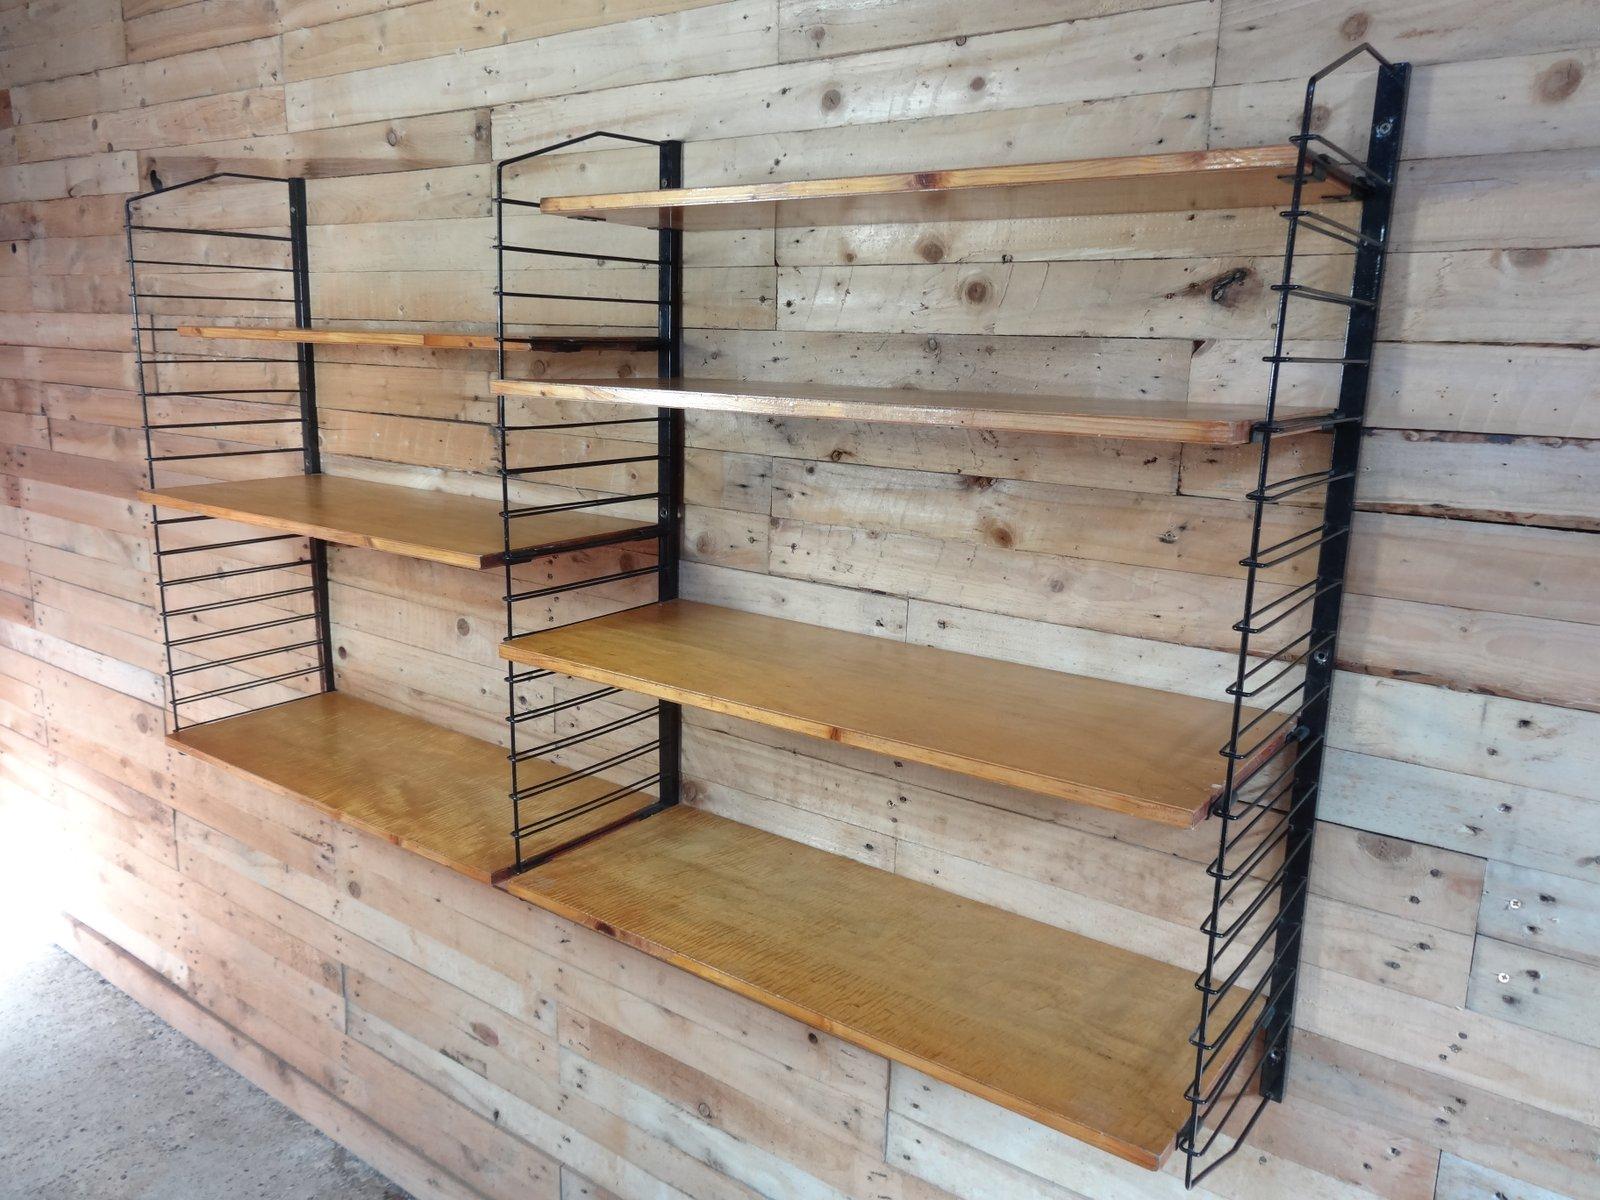 industrielles wandregal aus metall hellem holz 1955 bei pamono kaufen. Black Bedroom Furniture Sets. Home Design Ideas